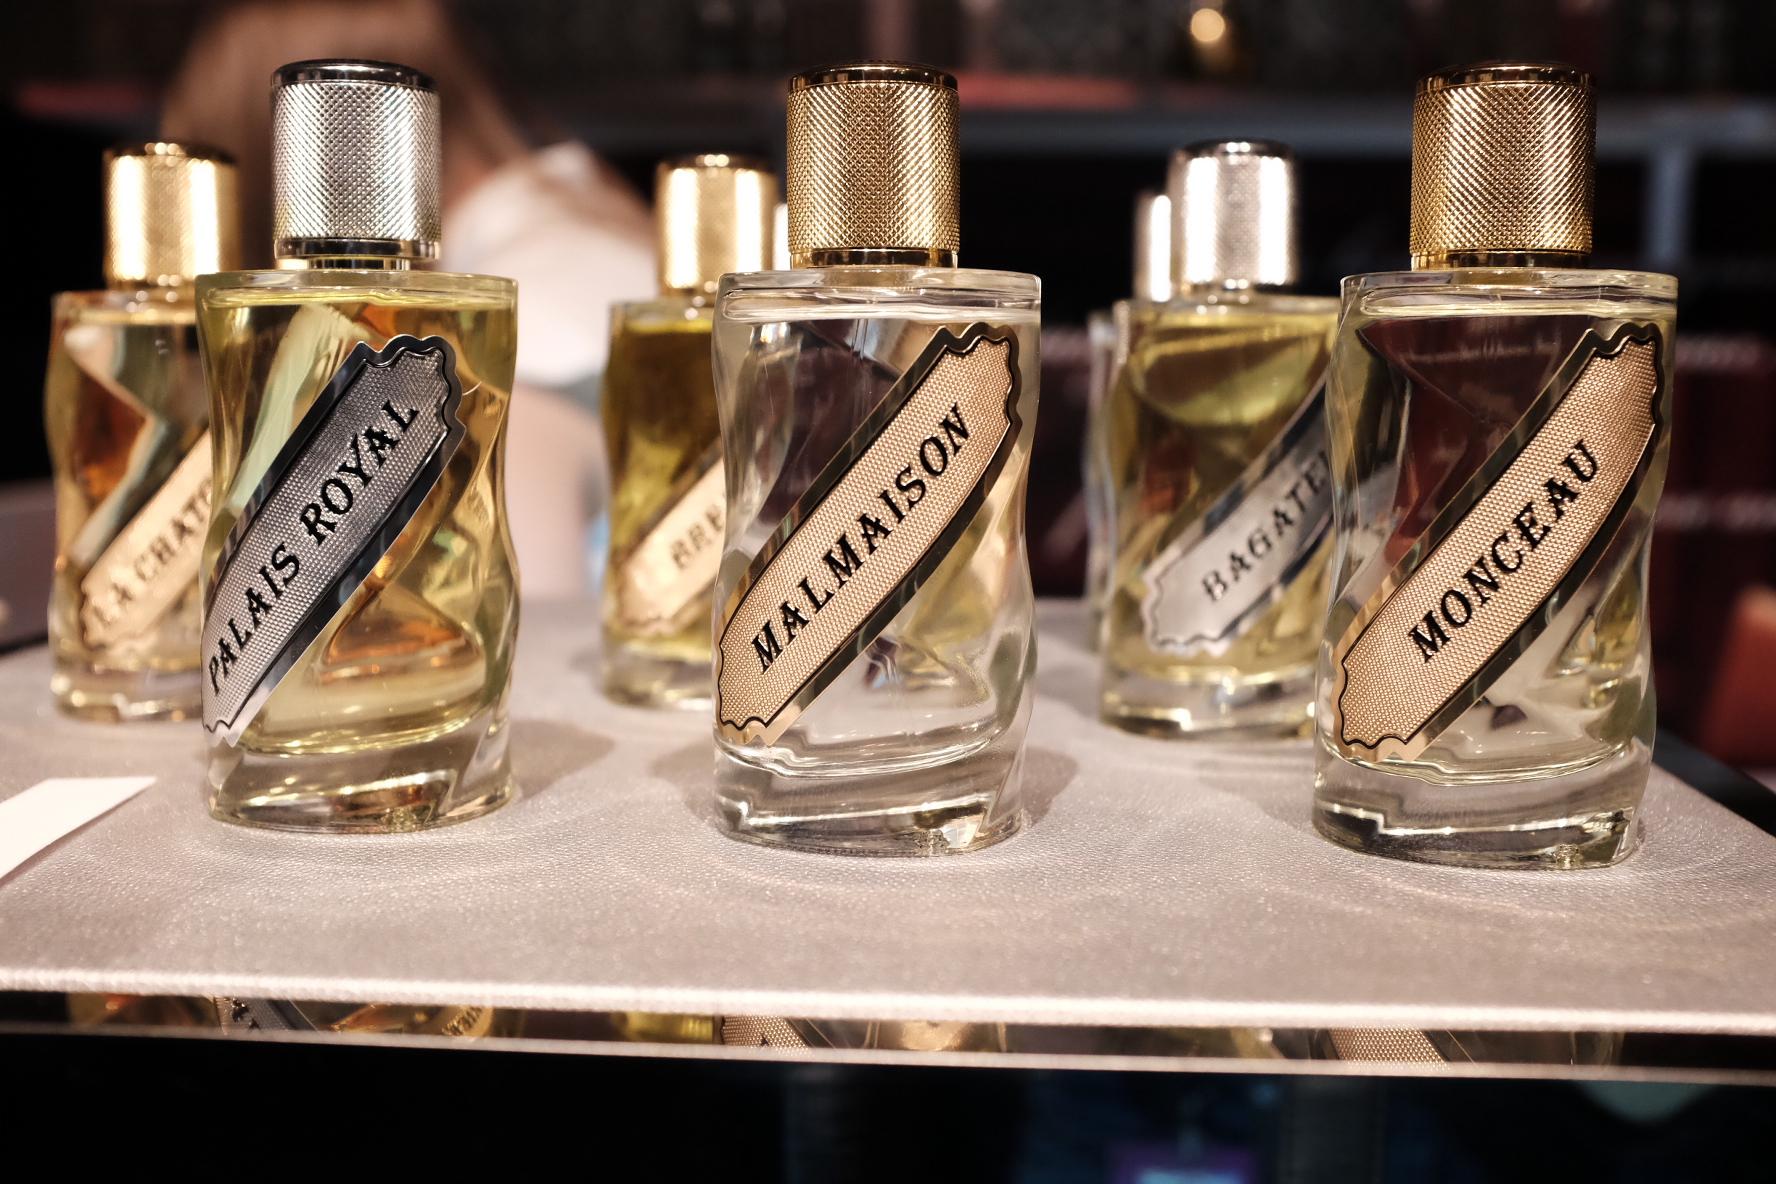 ароматы 12 Parfumeurs Francais